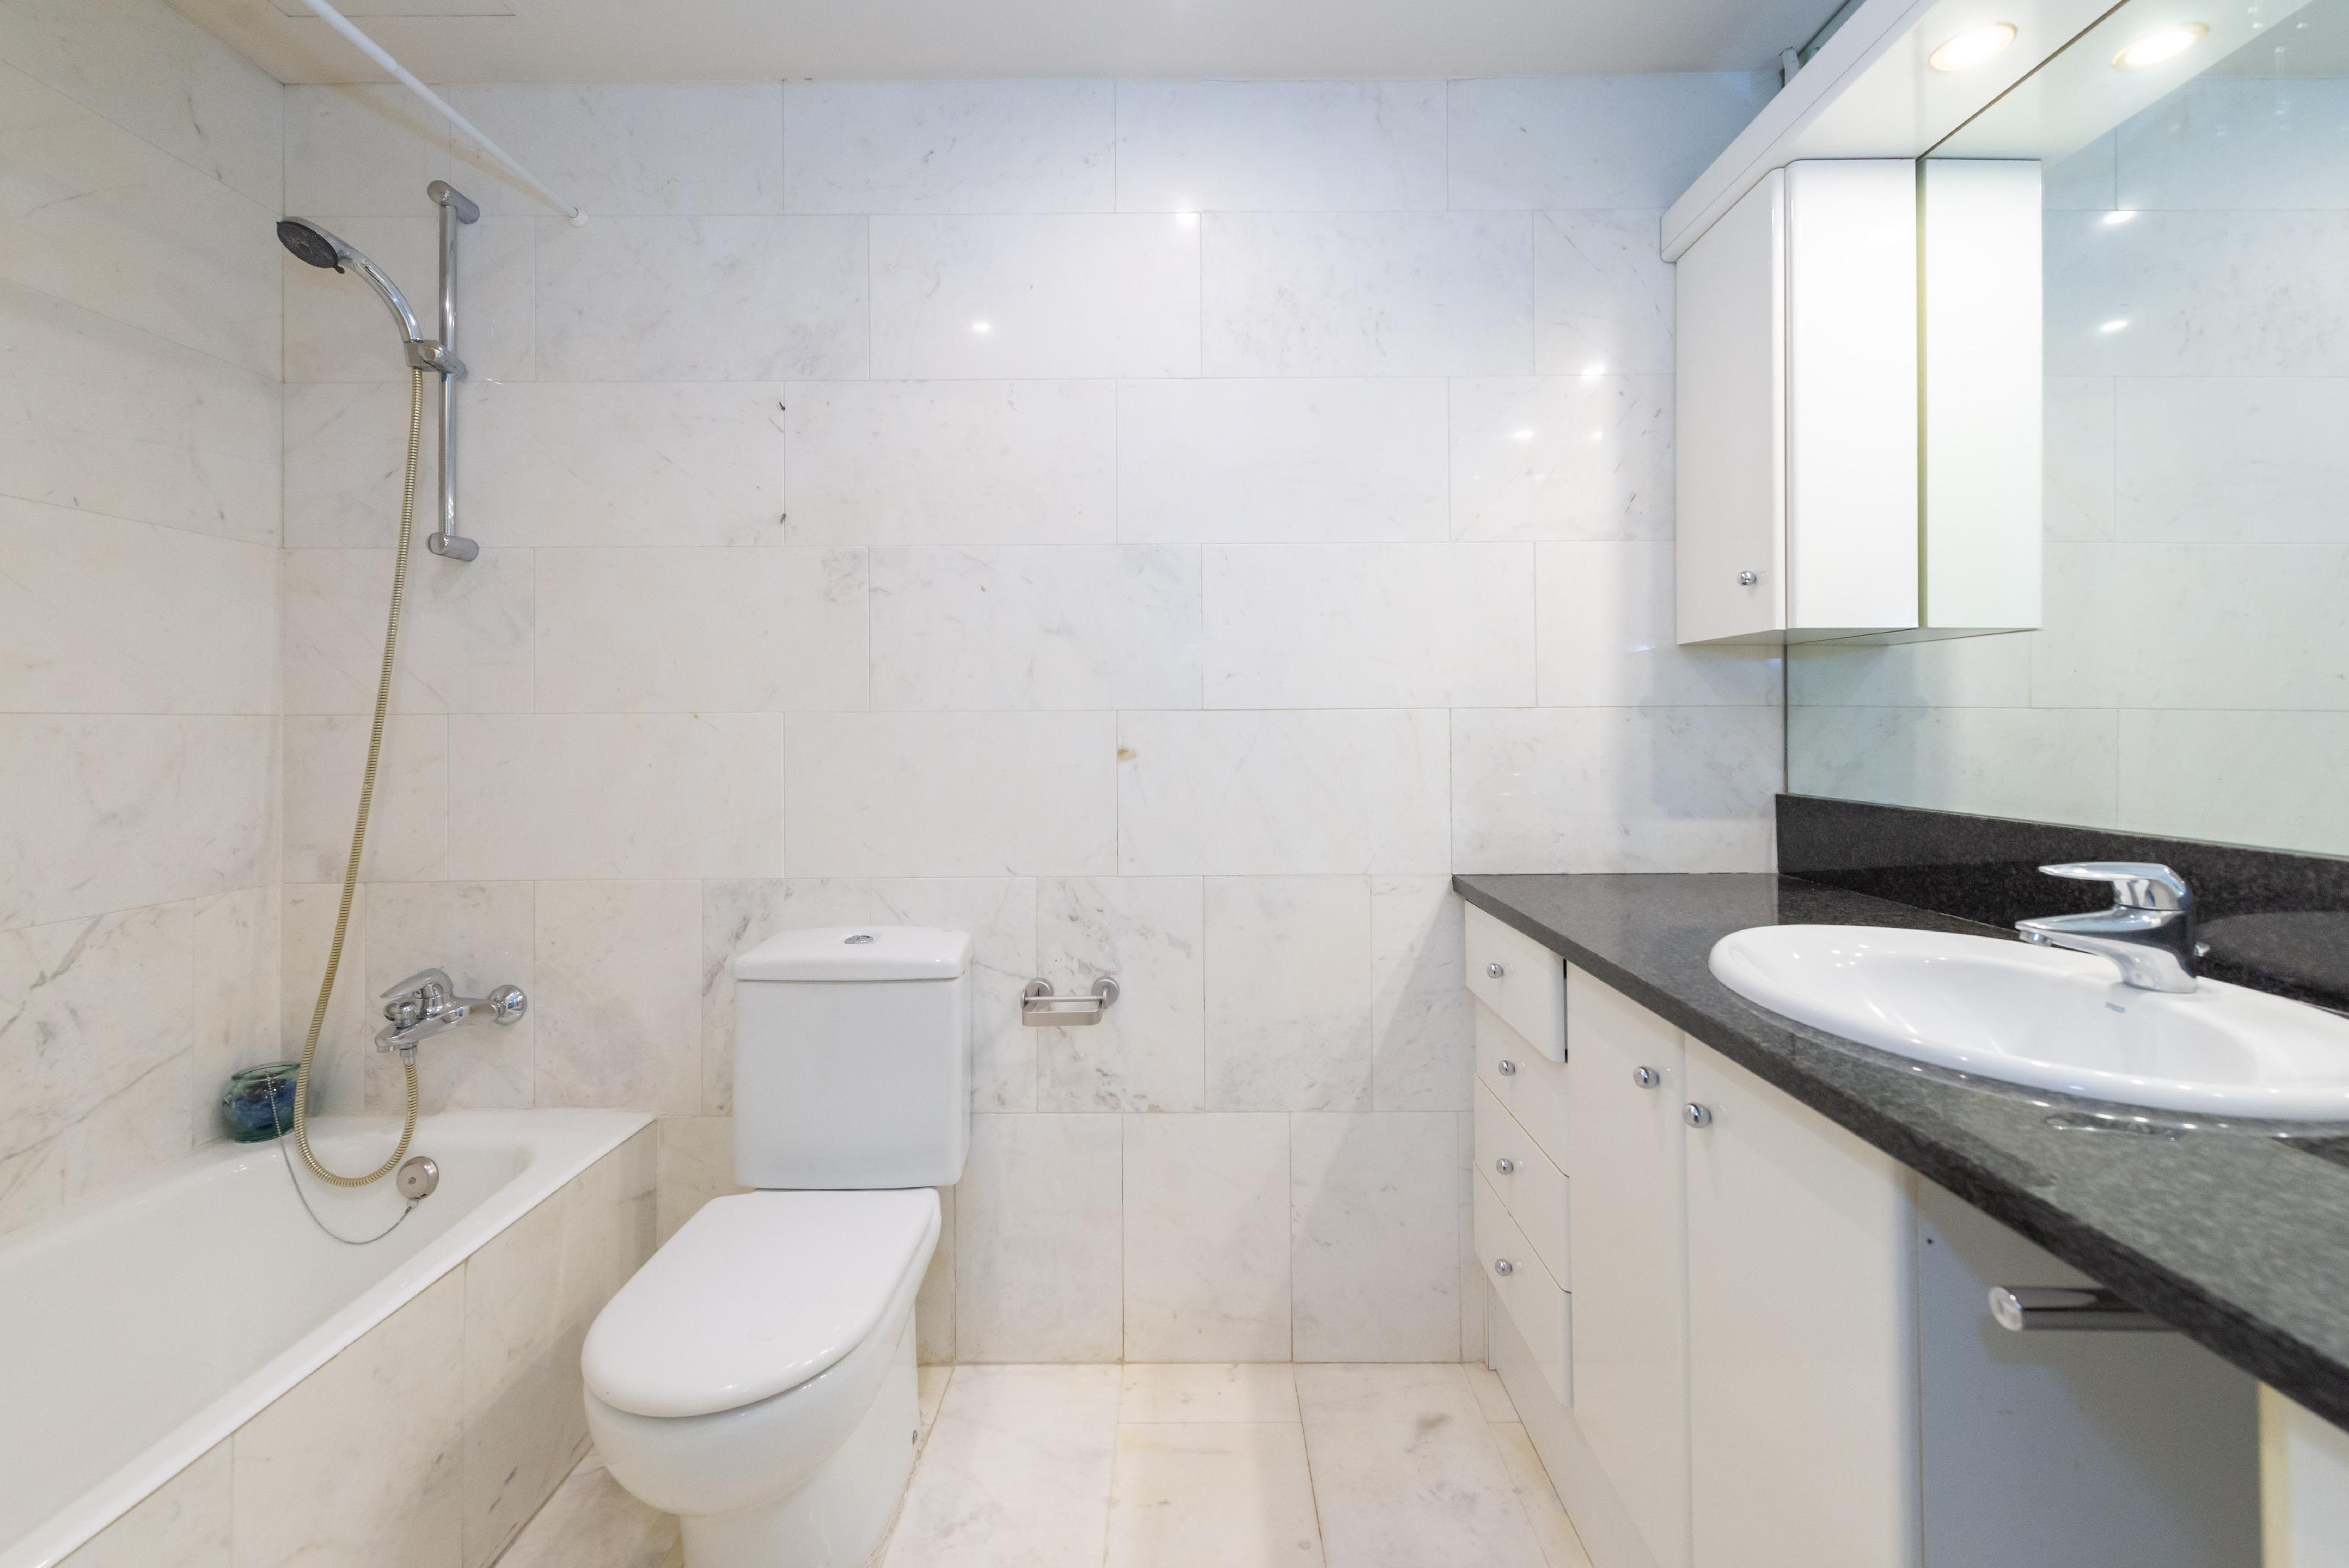 251446 Flat for sale in Sarrià-Sant Gervasi, Tres Torres 20